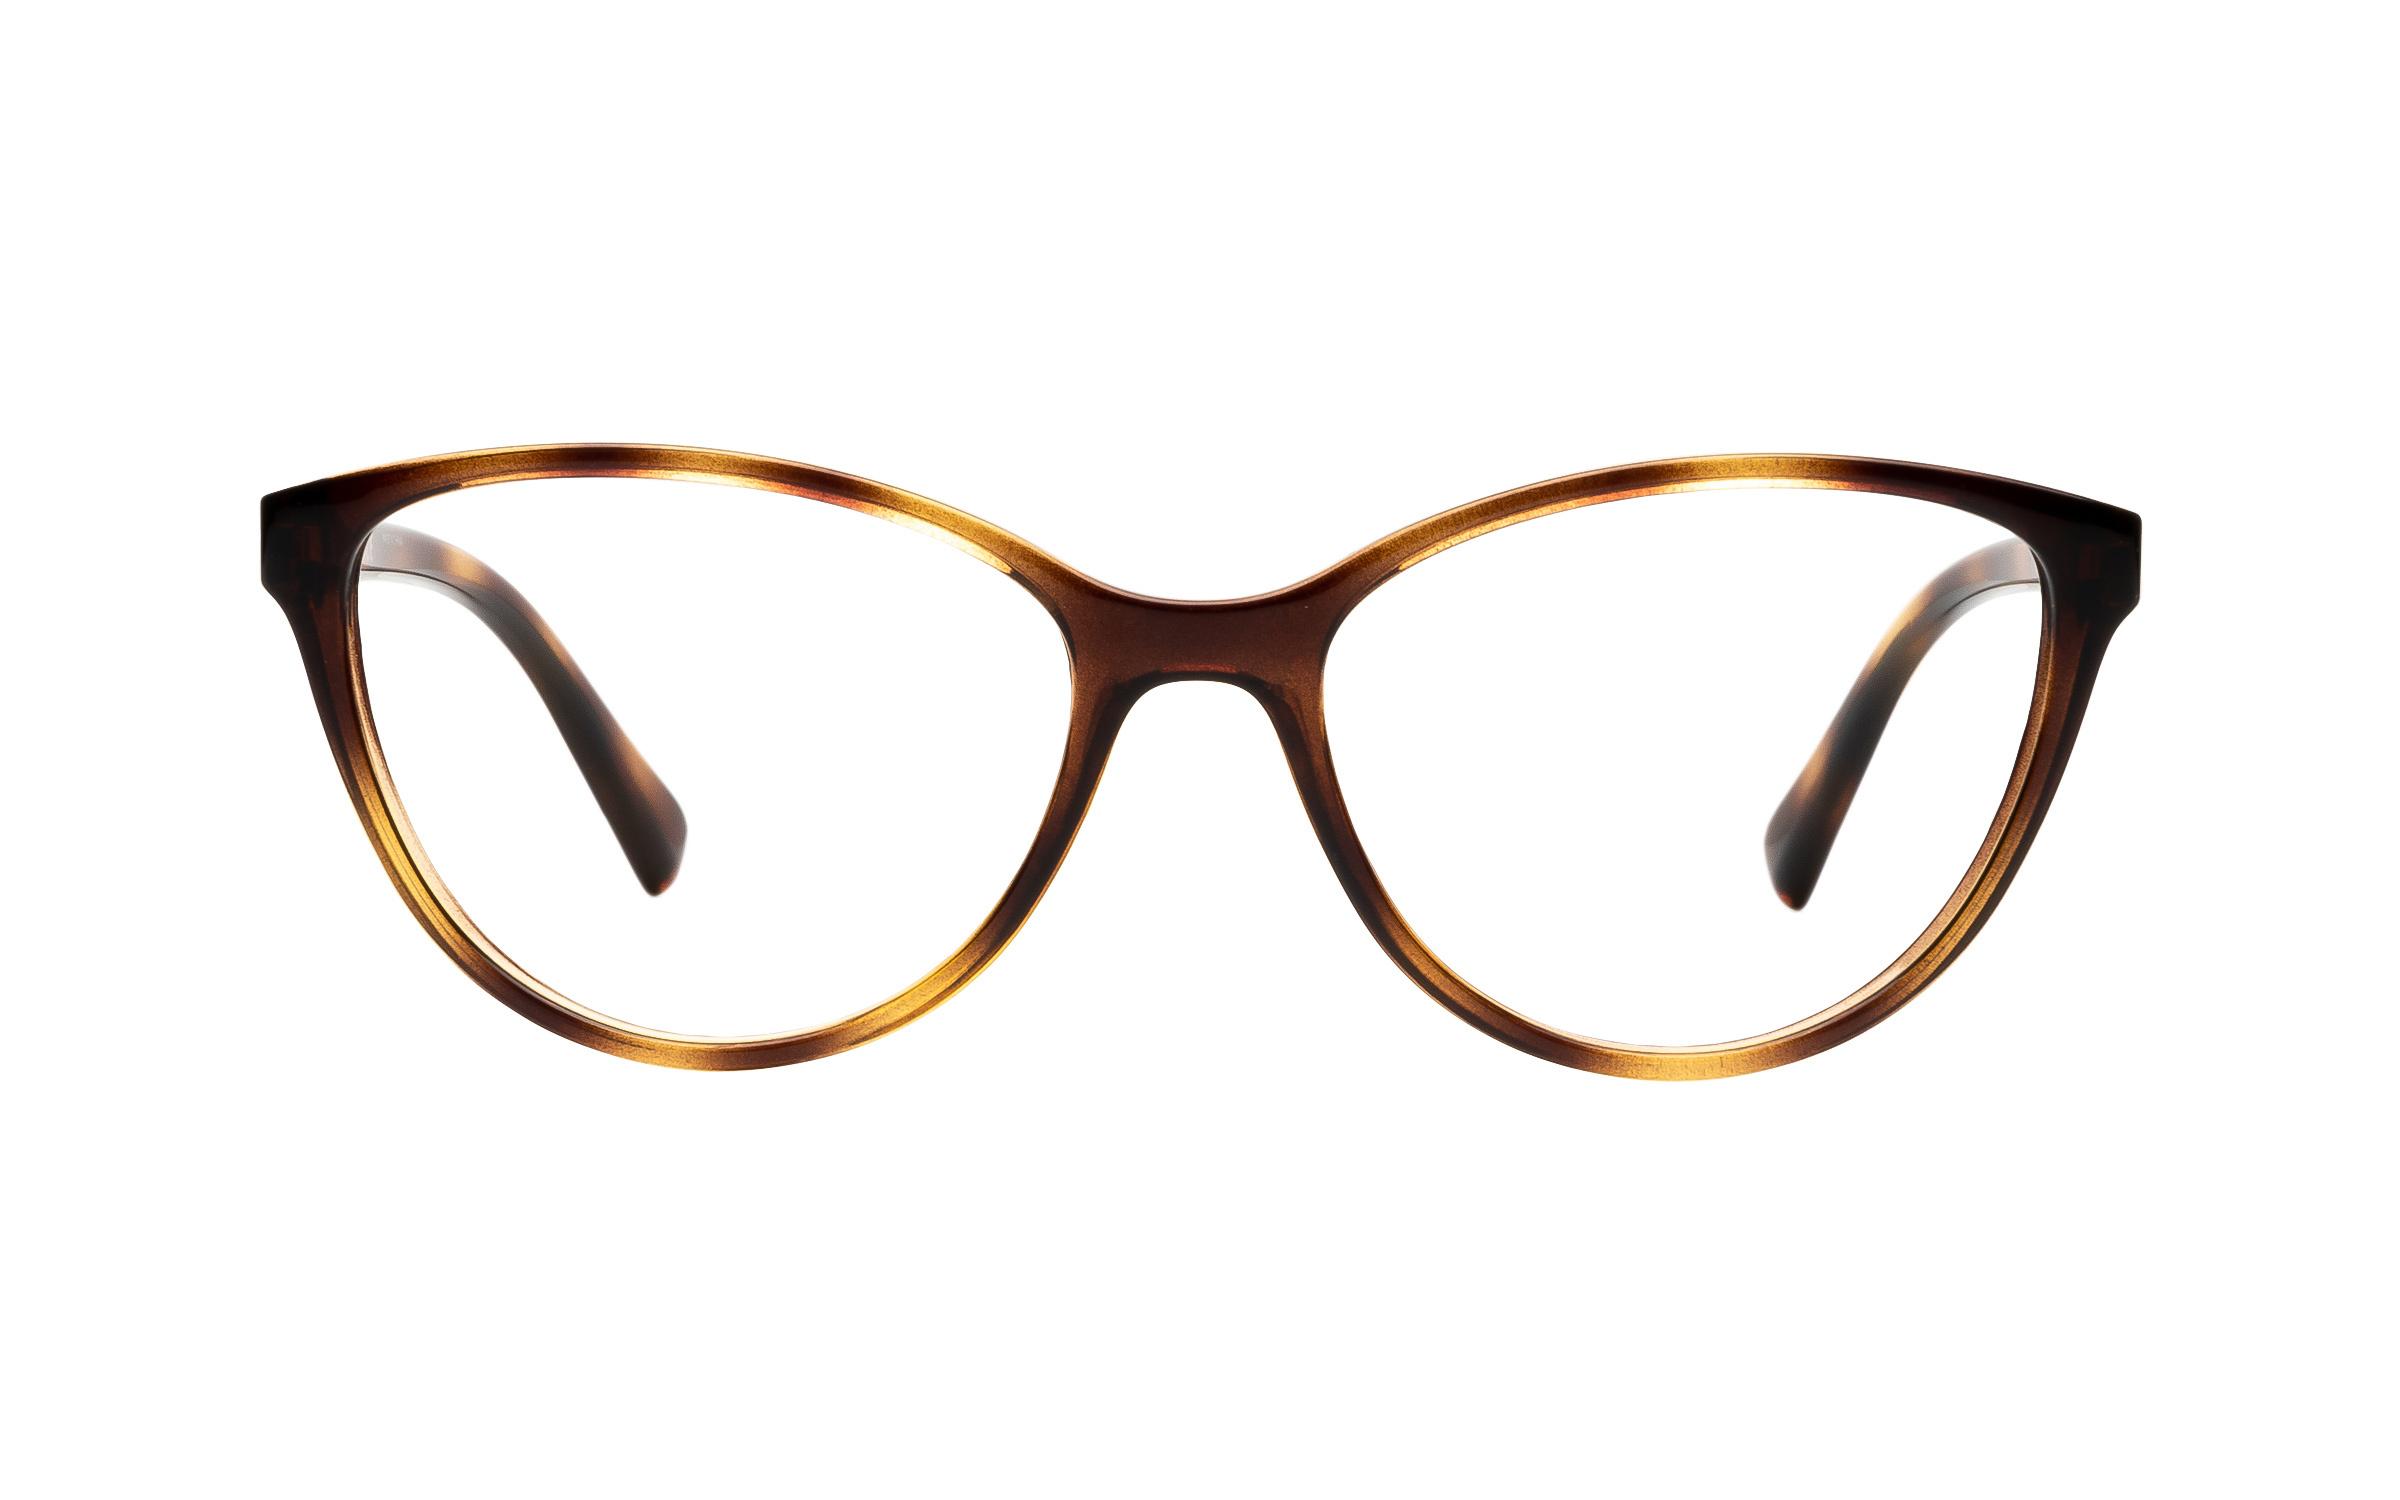 Luxottica Armani Exchange AX3053 8037 (53) Eyeglasses and Frame in Havana Tortoise - Online Coastal